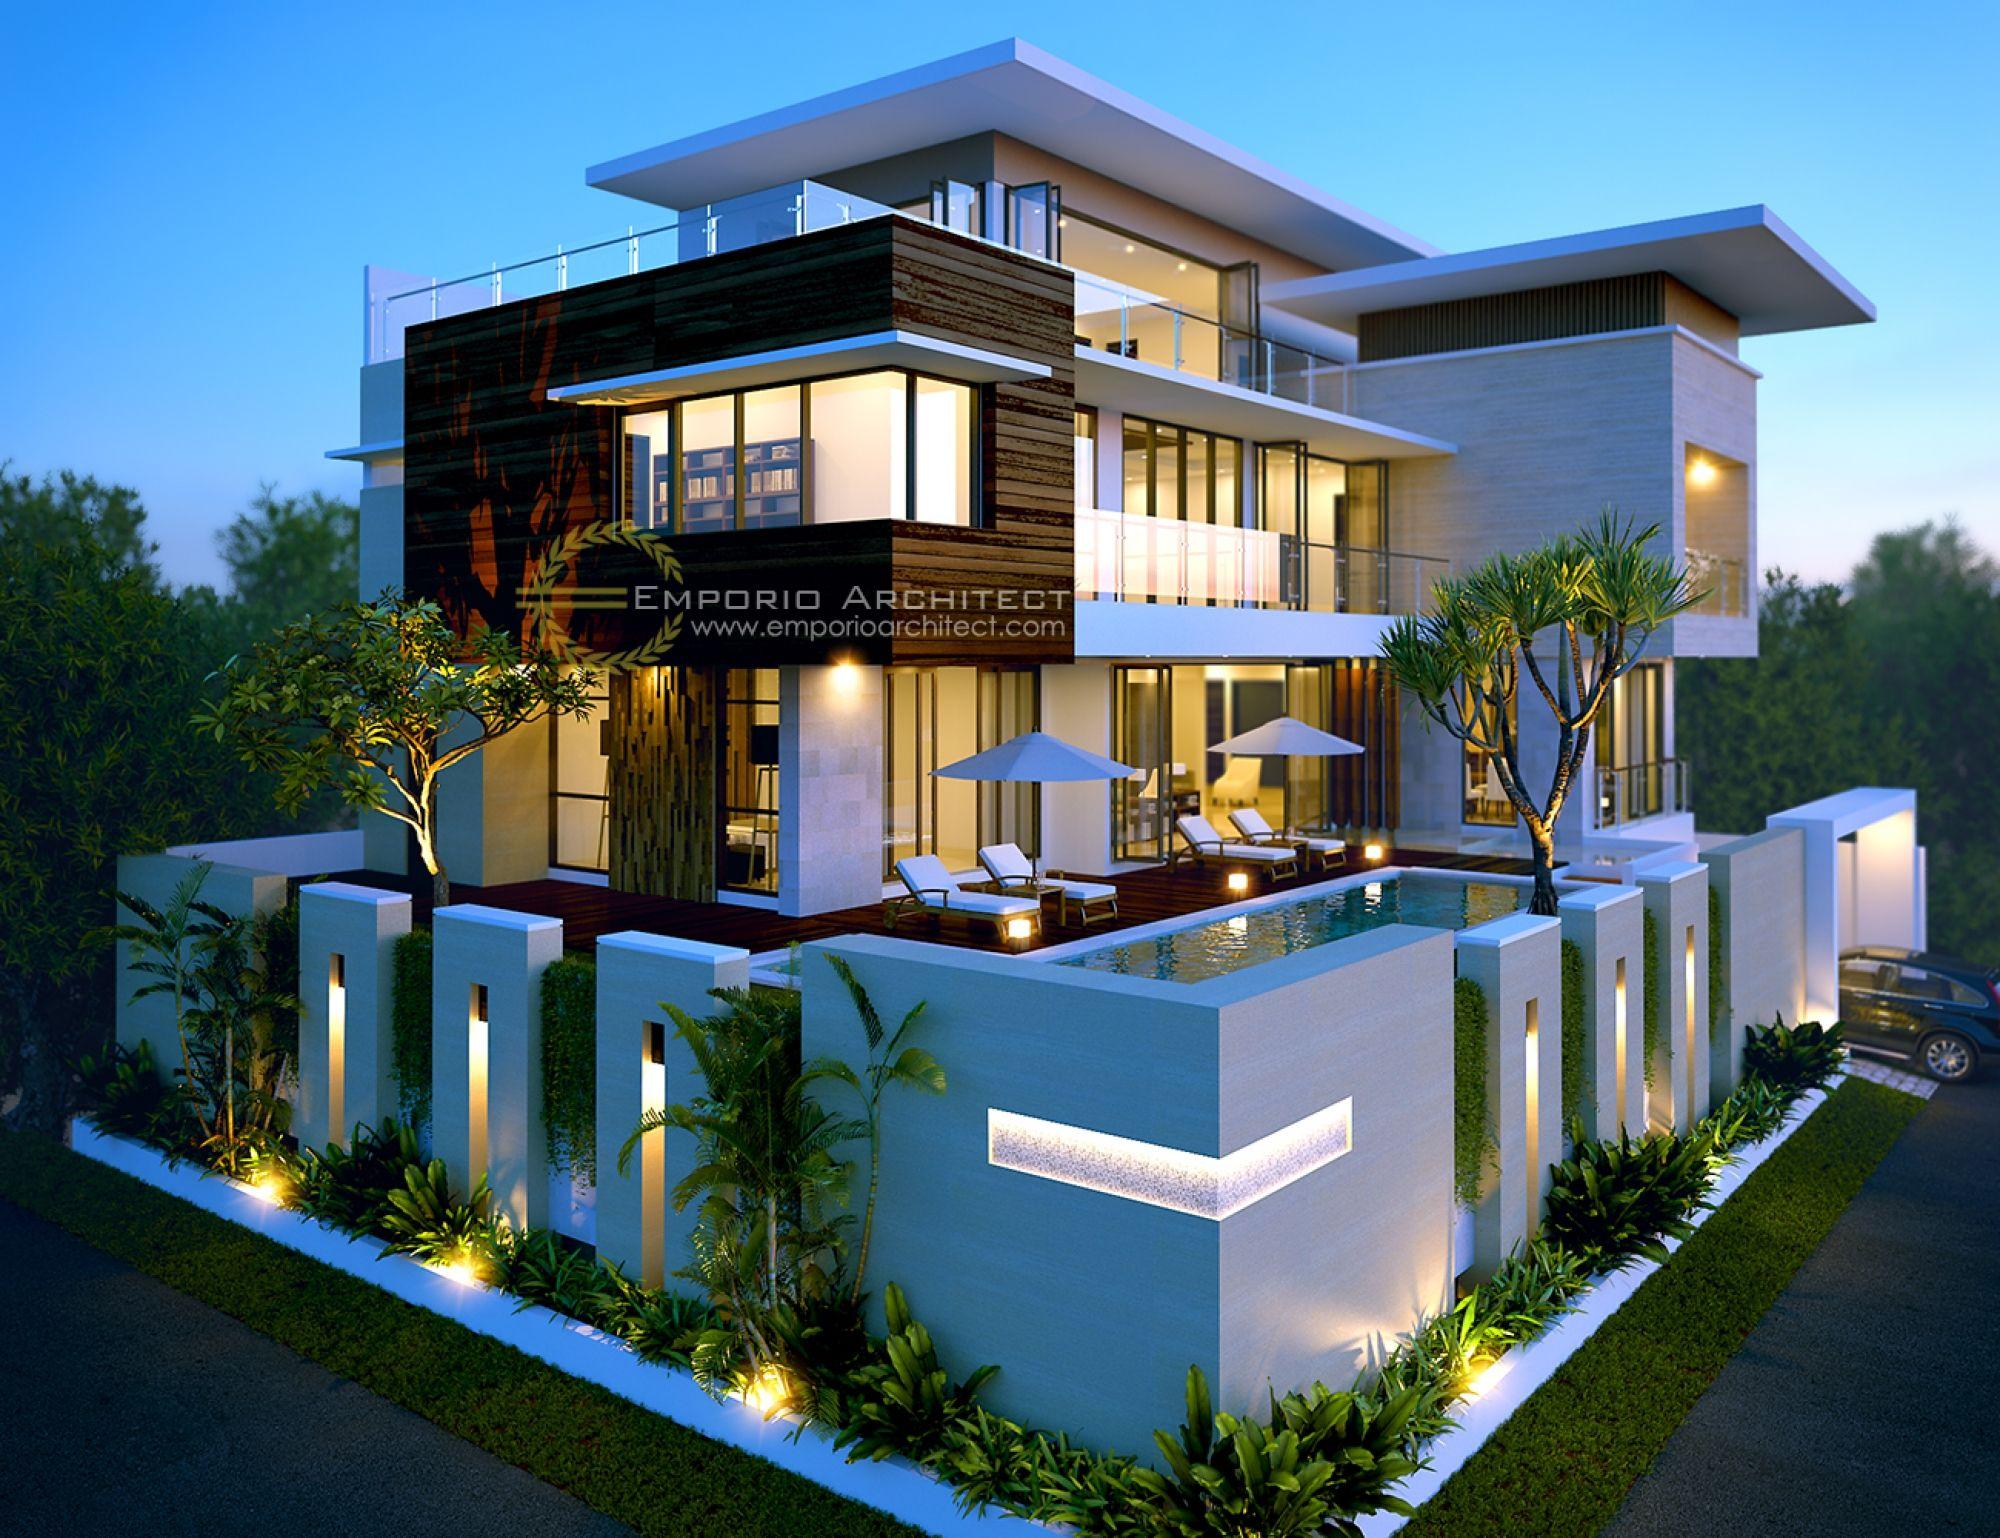 Jasa arsitek desain rumah bapak alex house elevation pinterest jasa arsitek desain rumah bapak alex malvernweather Gallery